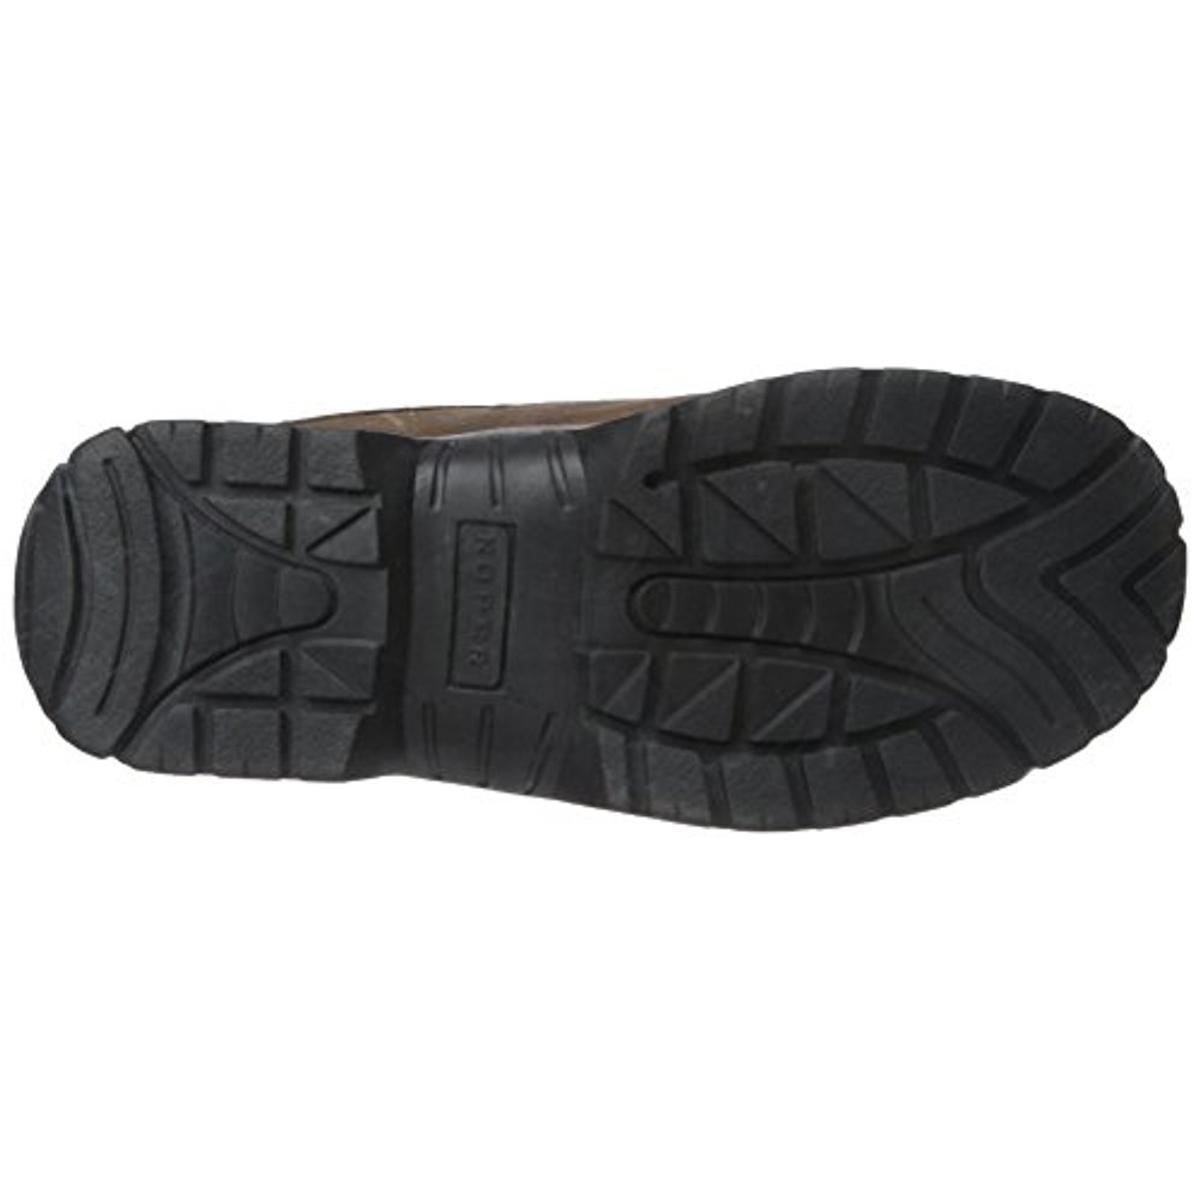 Roper Western Shoes Mens Stirrup Slip On Tan Oiled 09-020-1650-1560 TA